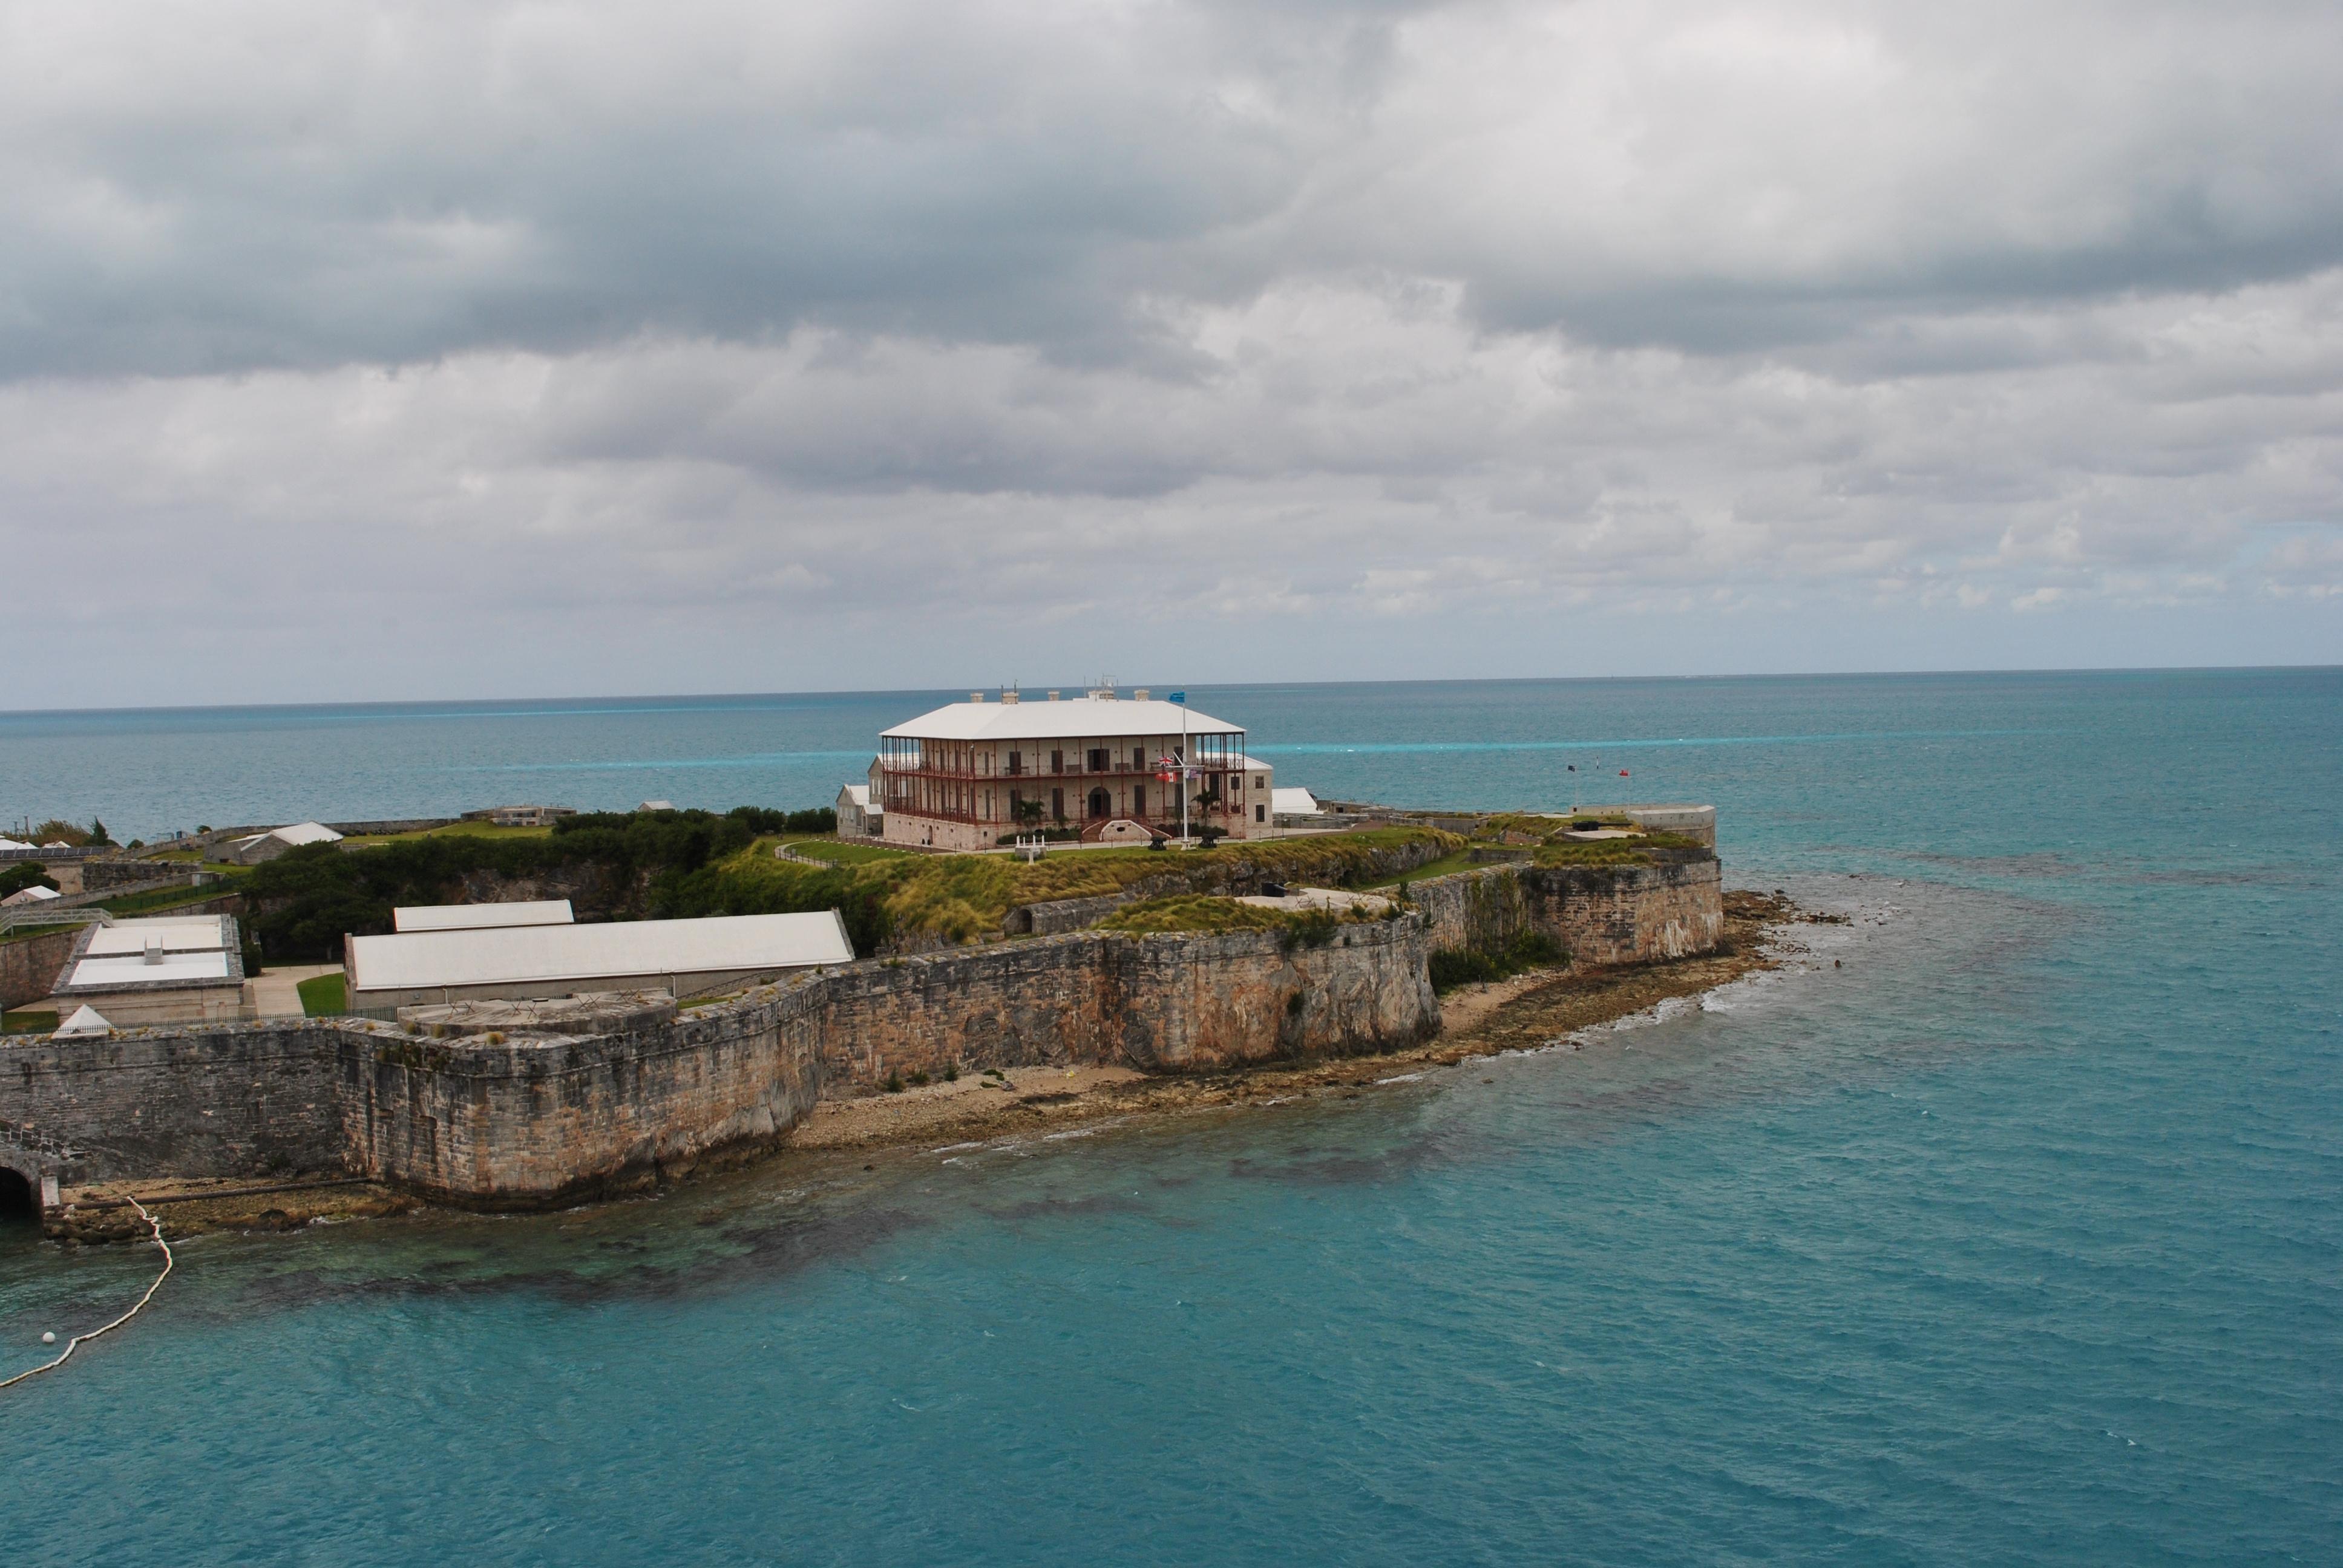 Royal Navy Dock Yard Bermuda